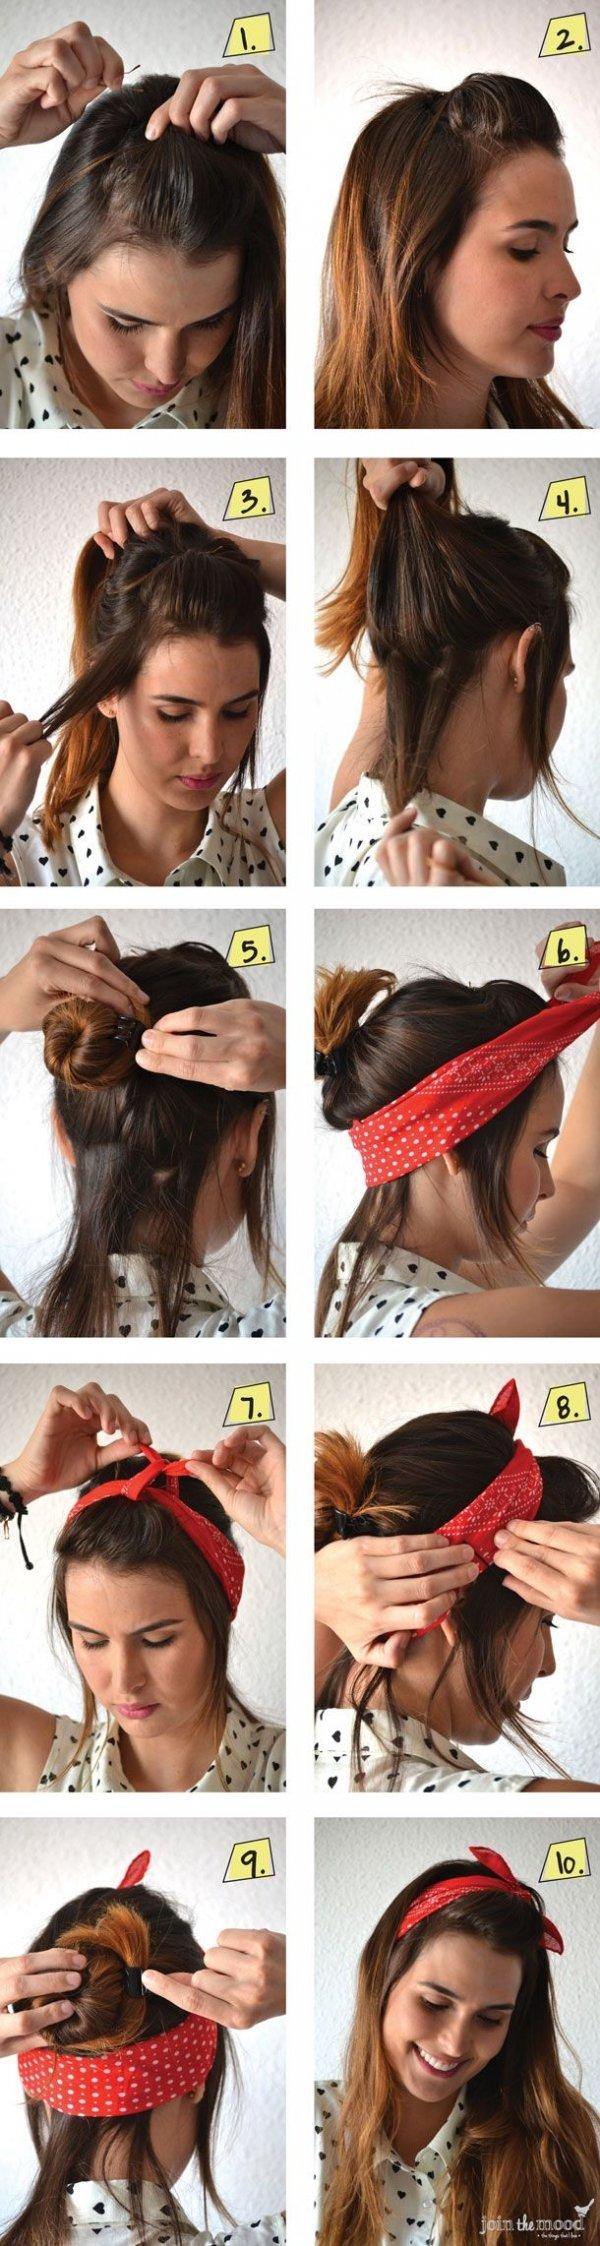 hair,clothing,hairstyle,eyewear,glasses,